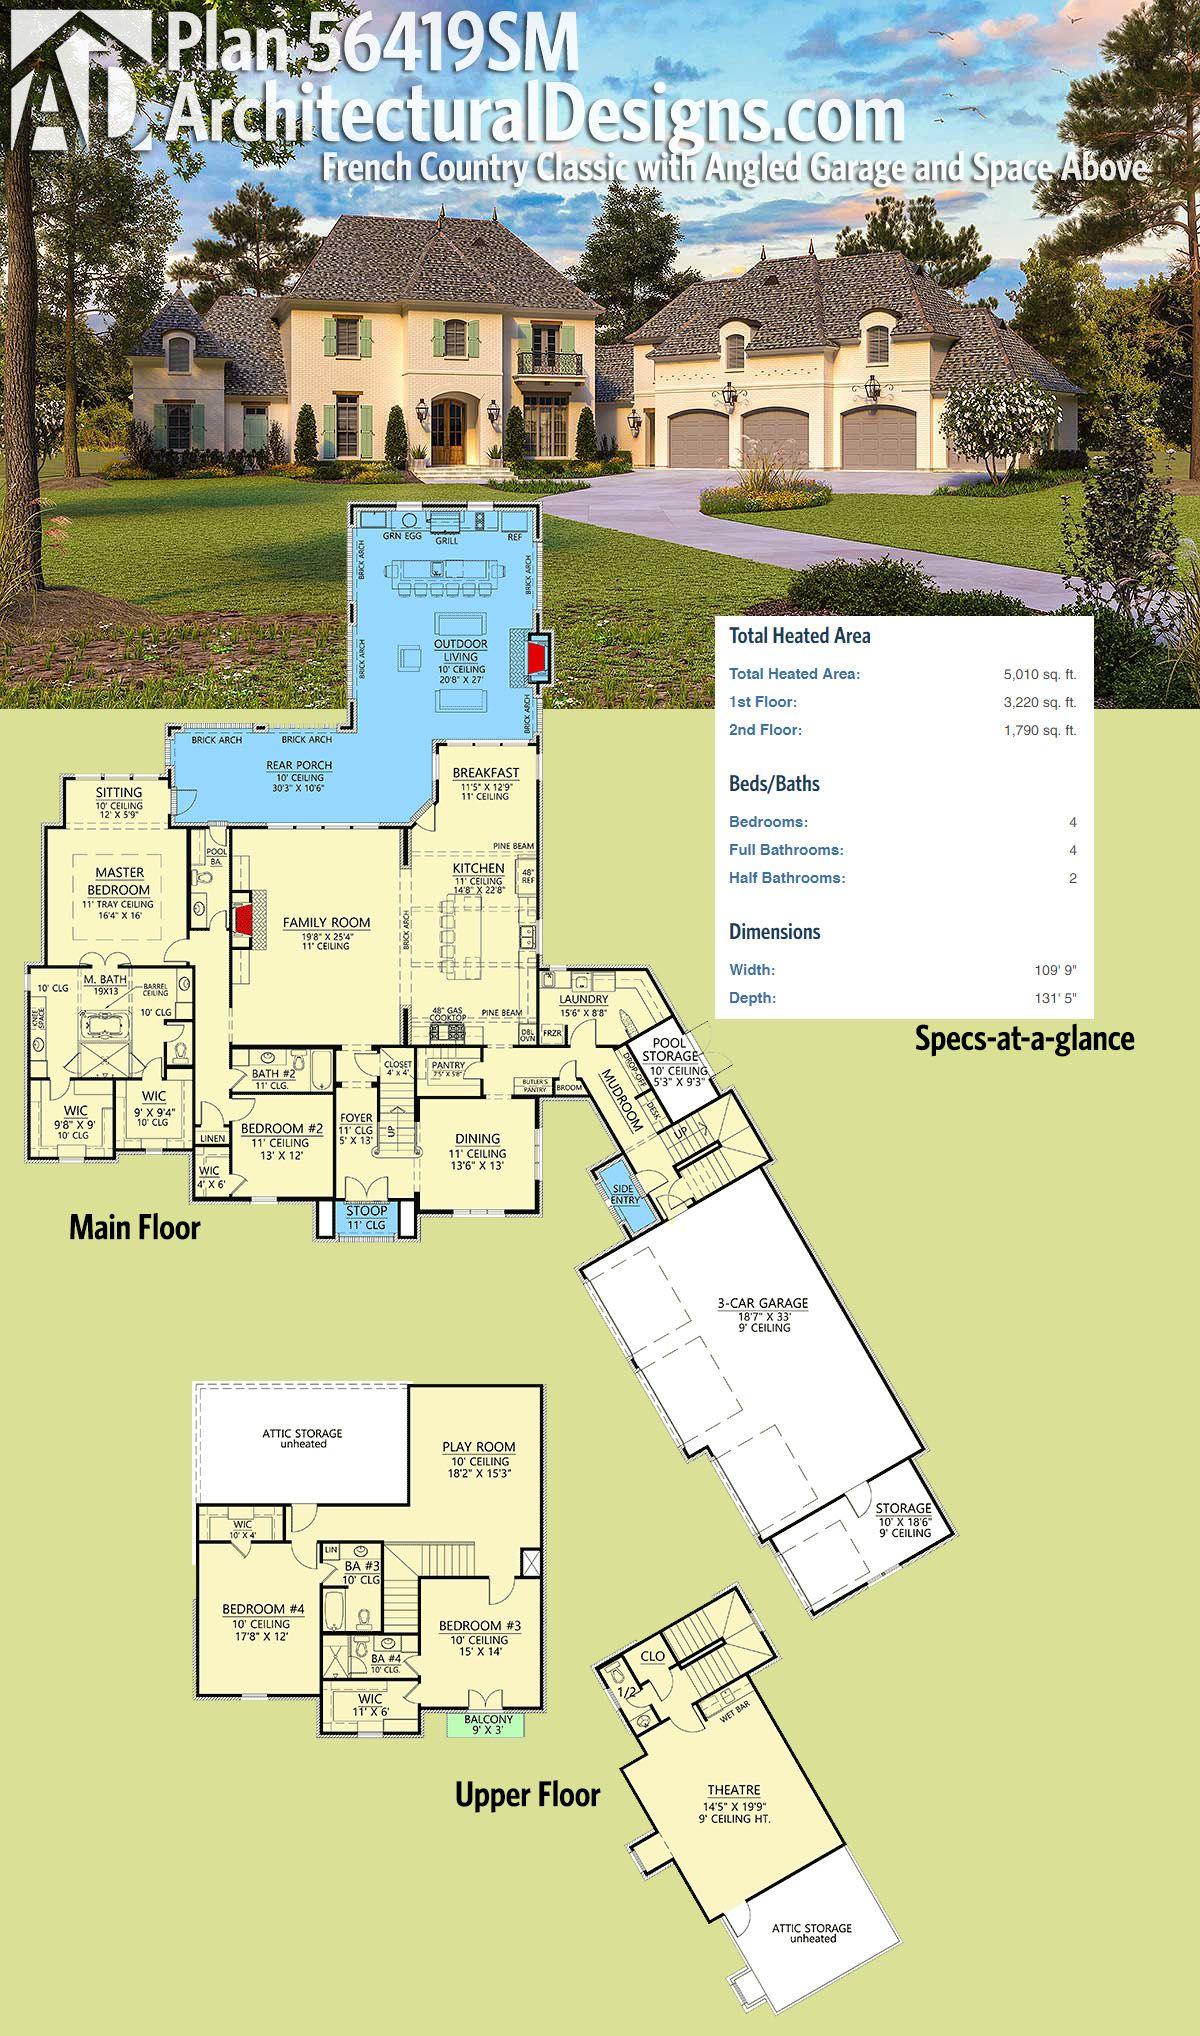 Architectural Designs House Plan 56419SM has a